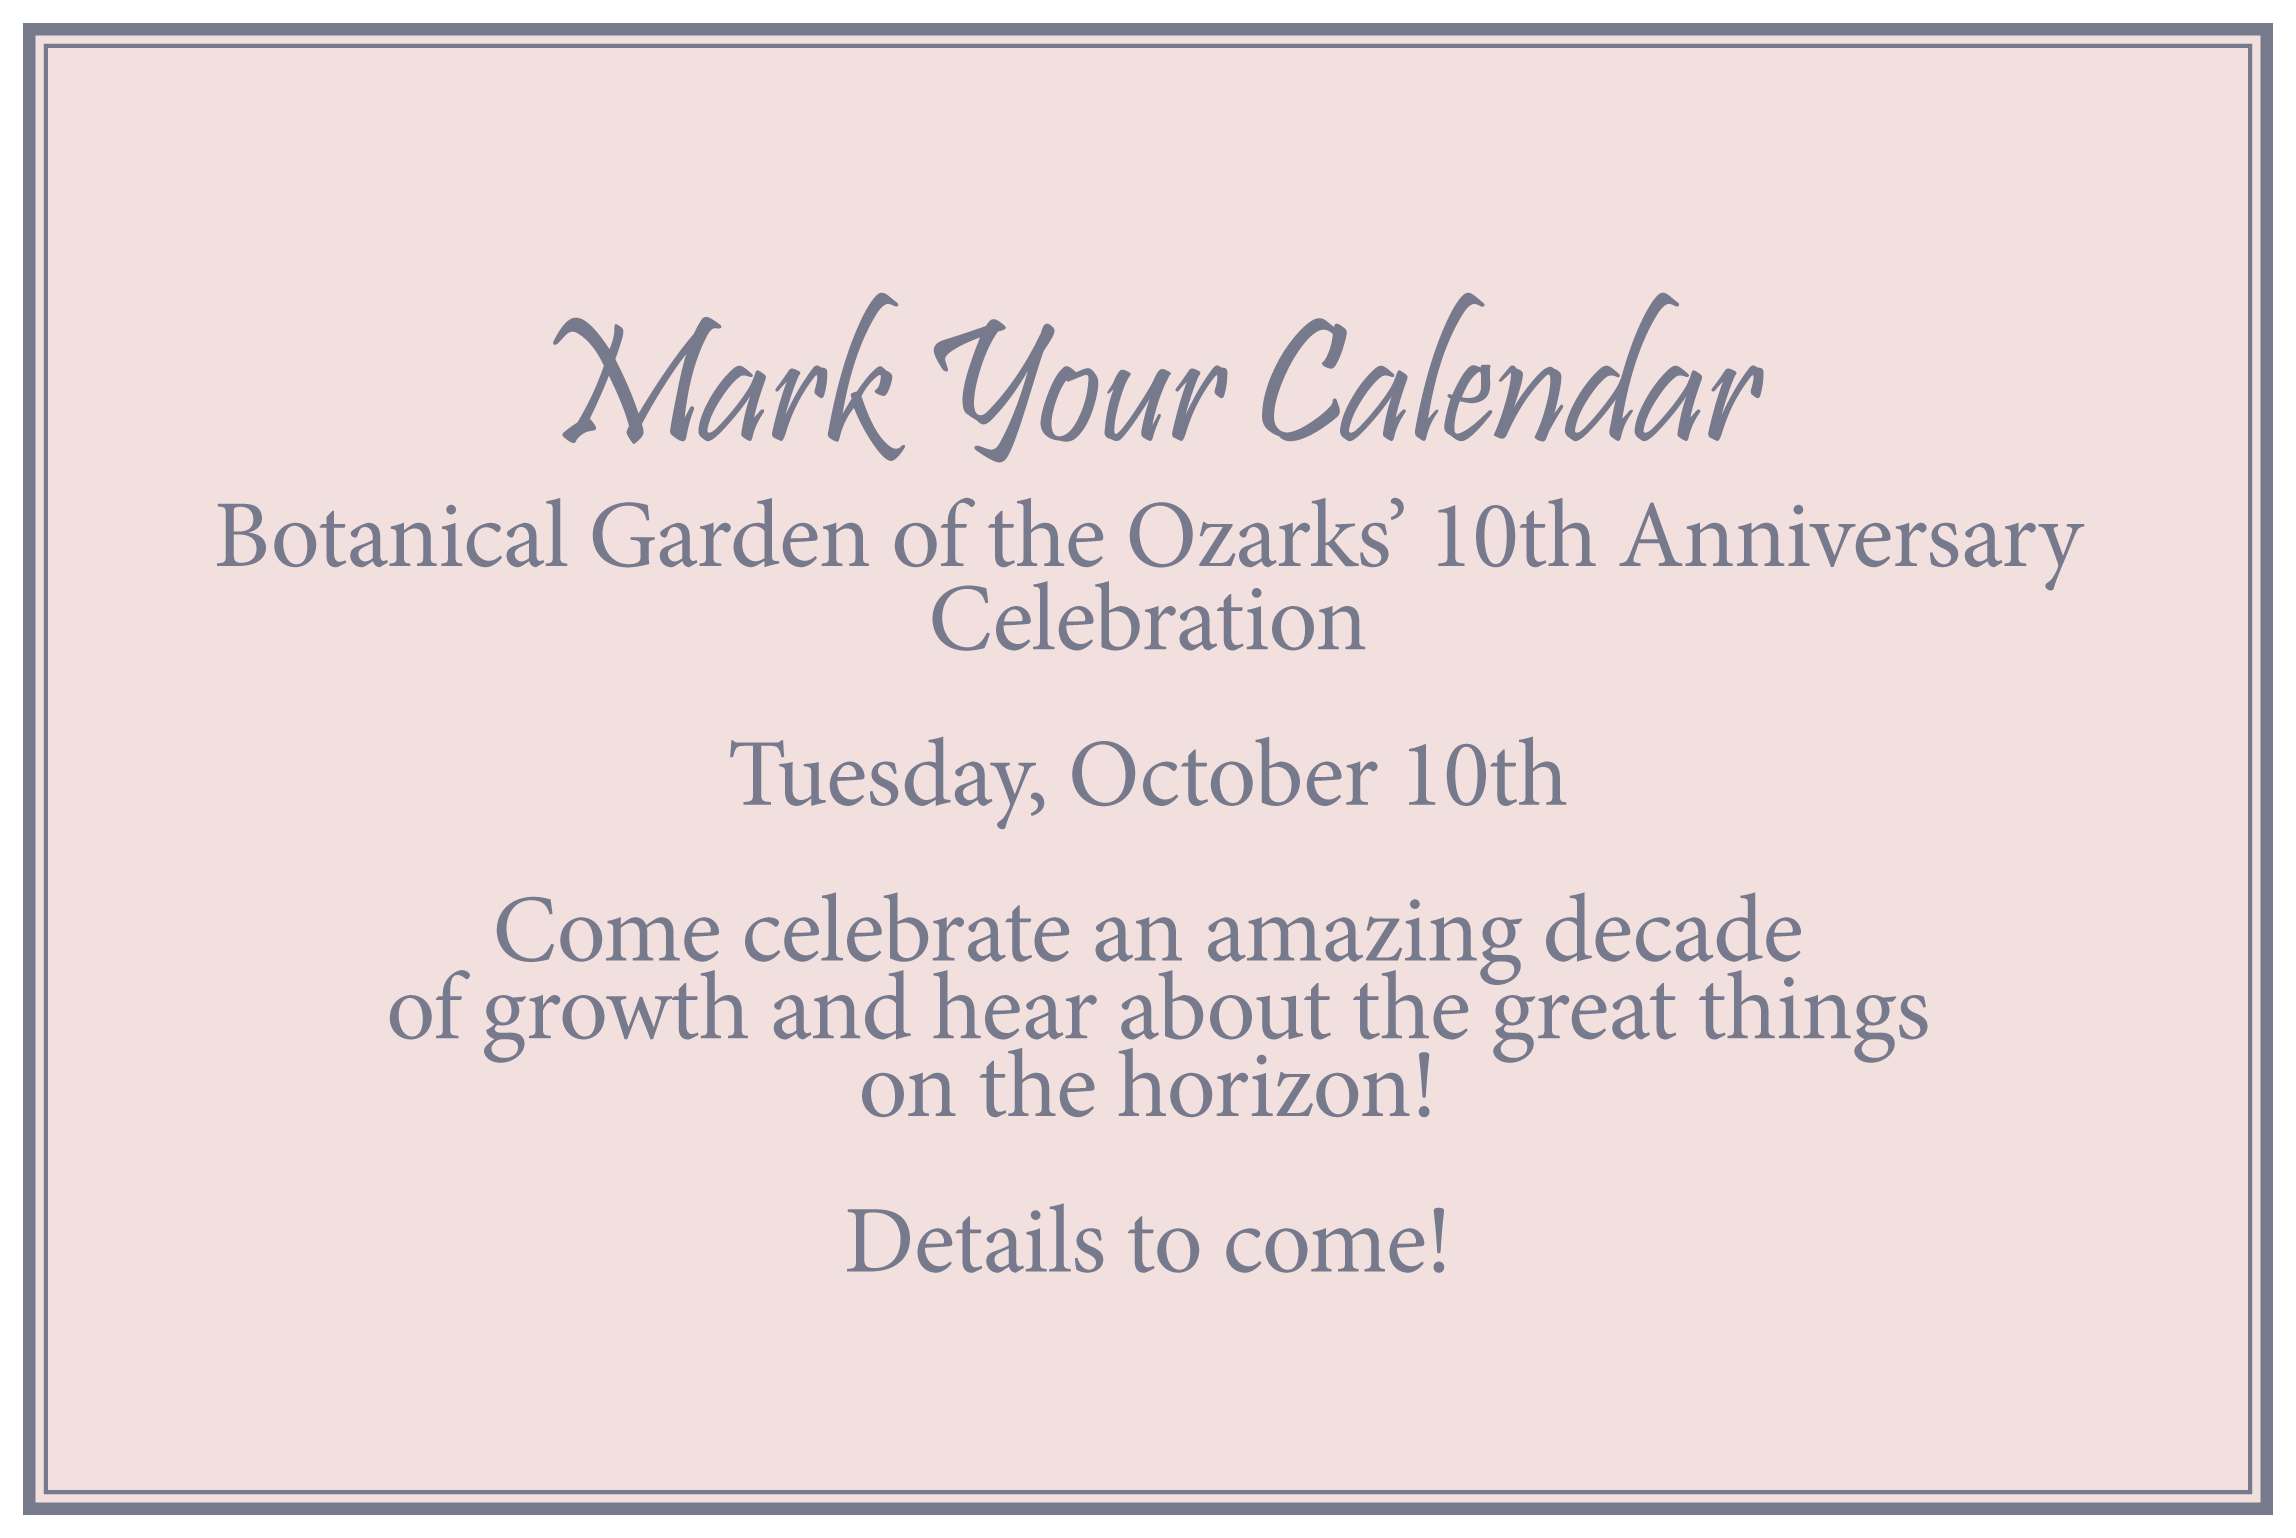 Bgo 10th Anniversary Celebration Botanical Garden Of The Ozarks